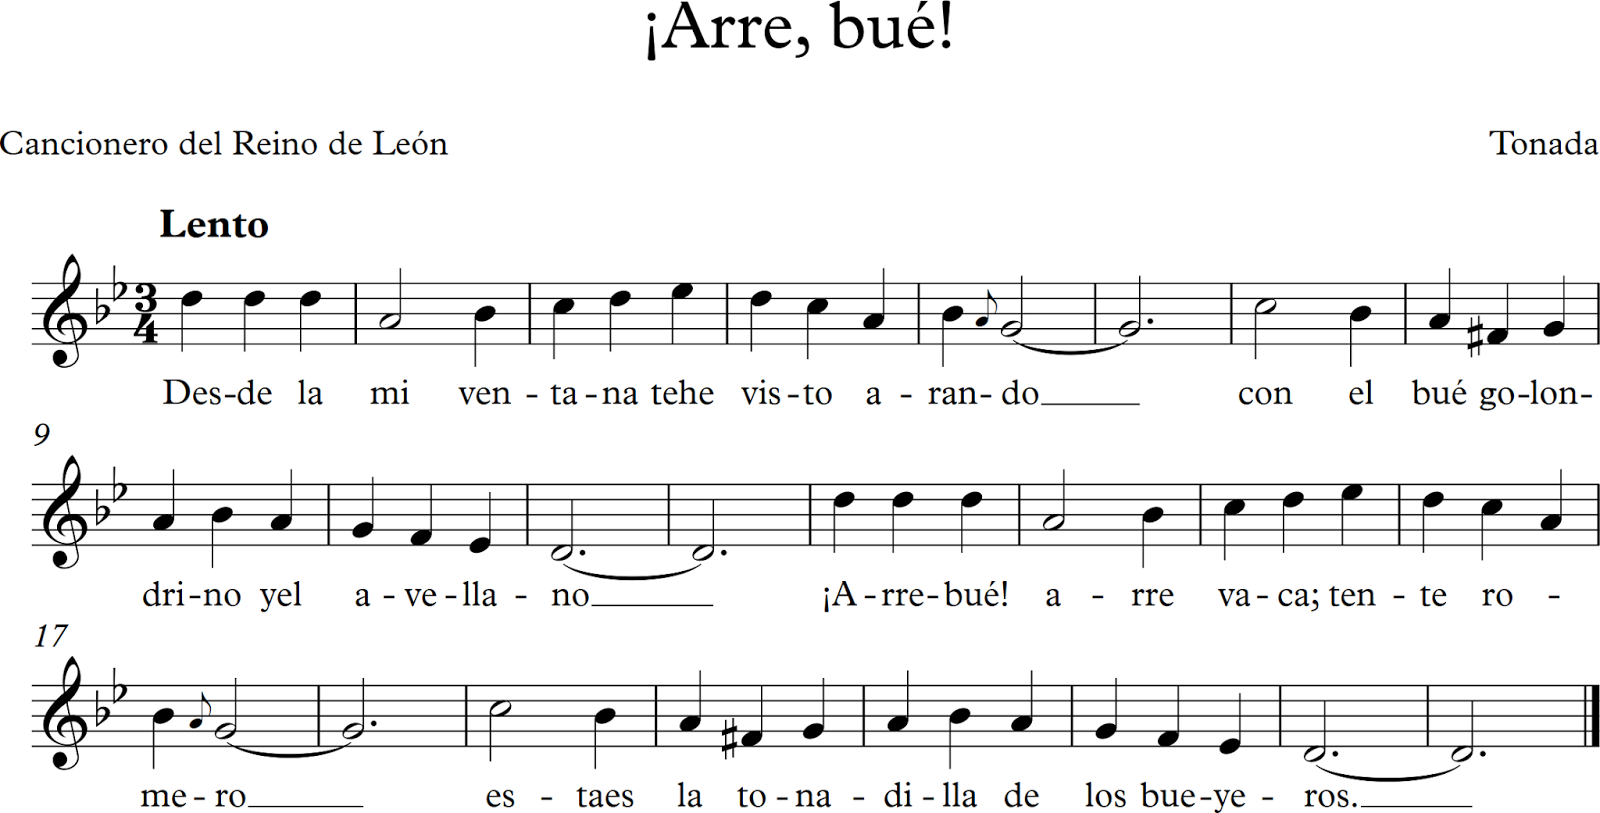 Descubriendo La Música Arre Bué Musica Partituras Partituras Musica